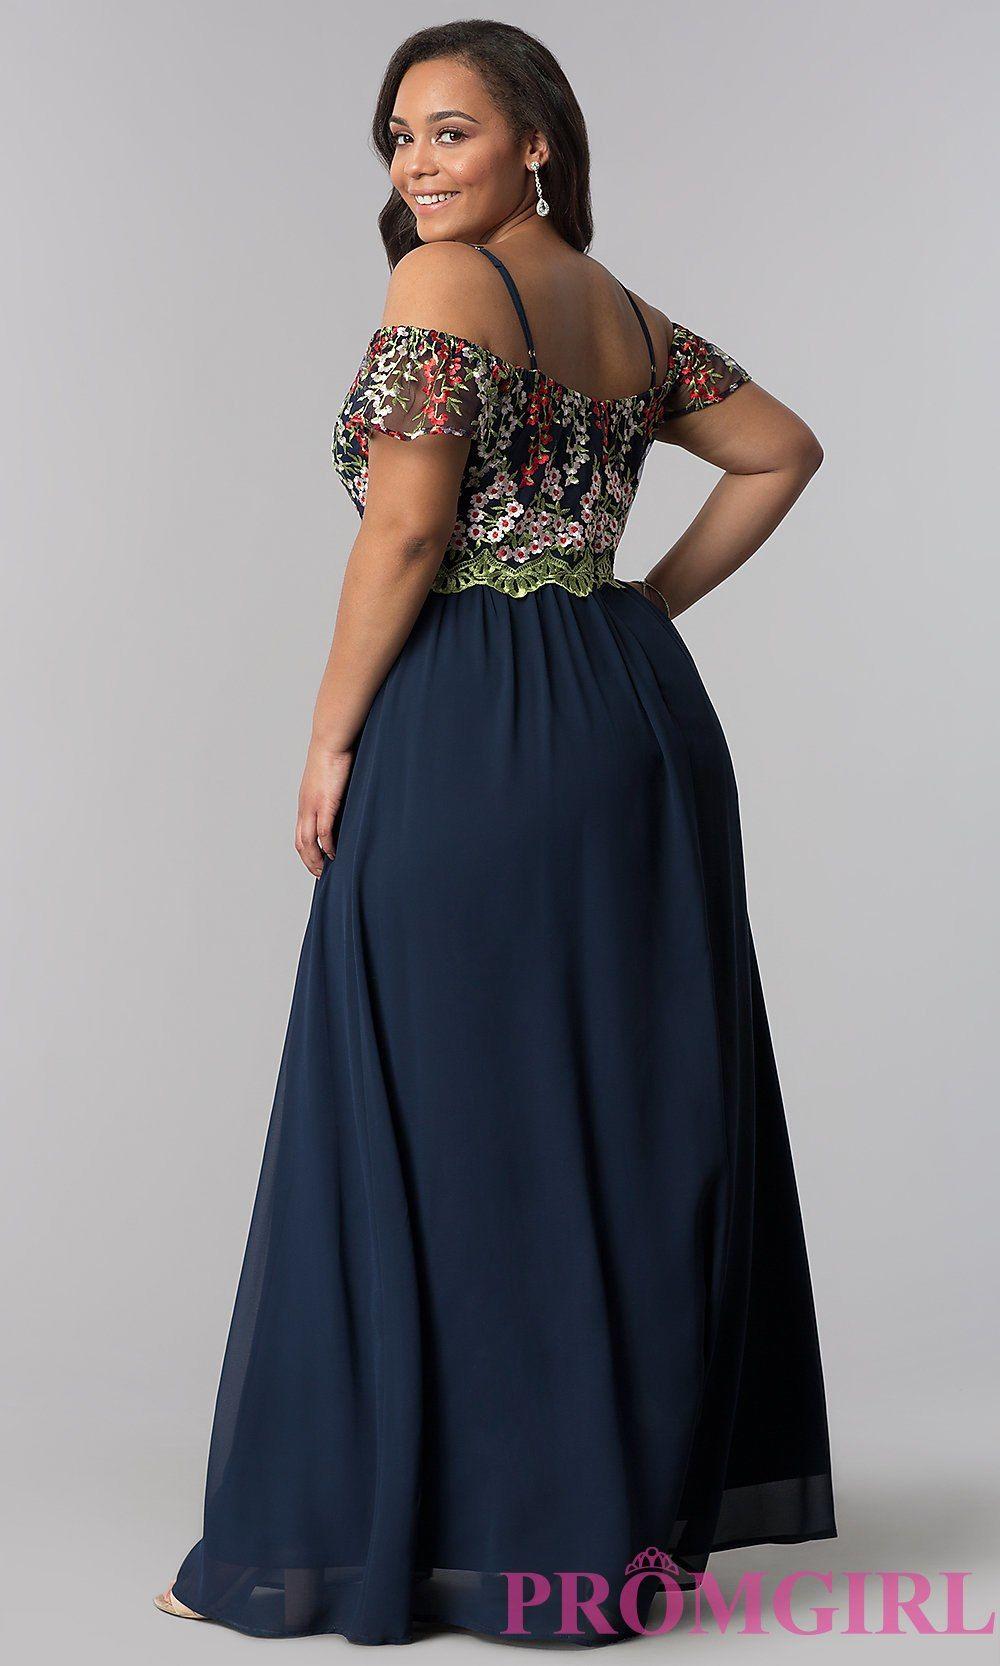 Long Plus Size Off The Shoulder Prom Dress Dresses Plus Prom Dresses Affordable Evening Dresses [ 1666 x 1000 Pixel ]